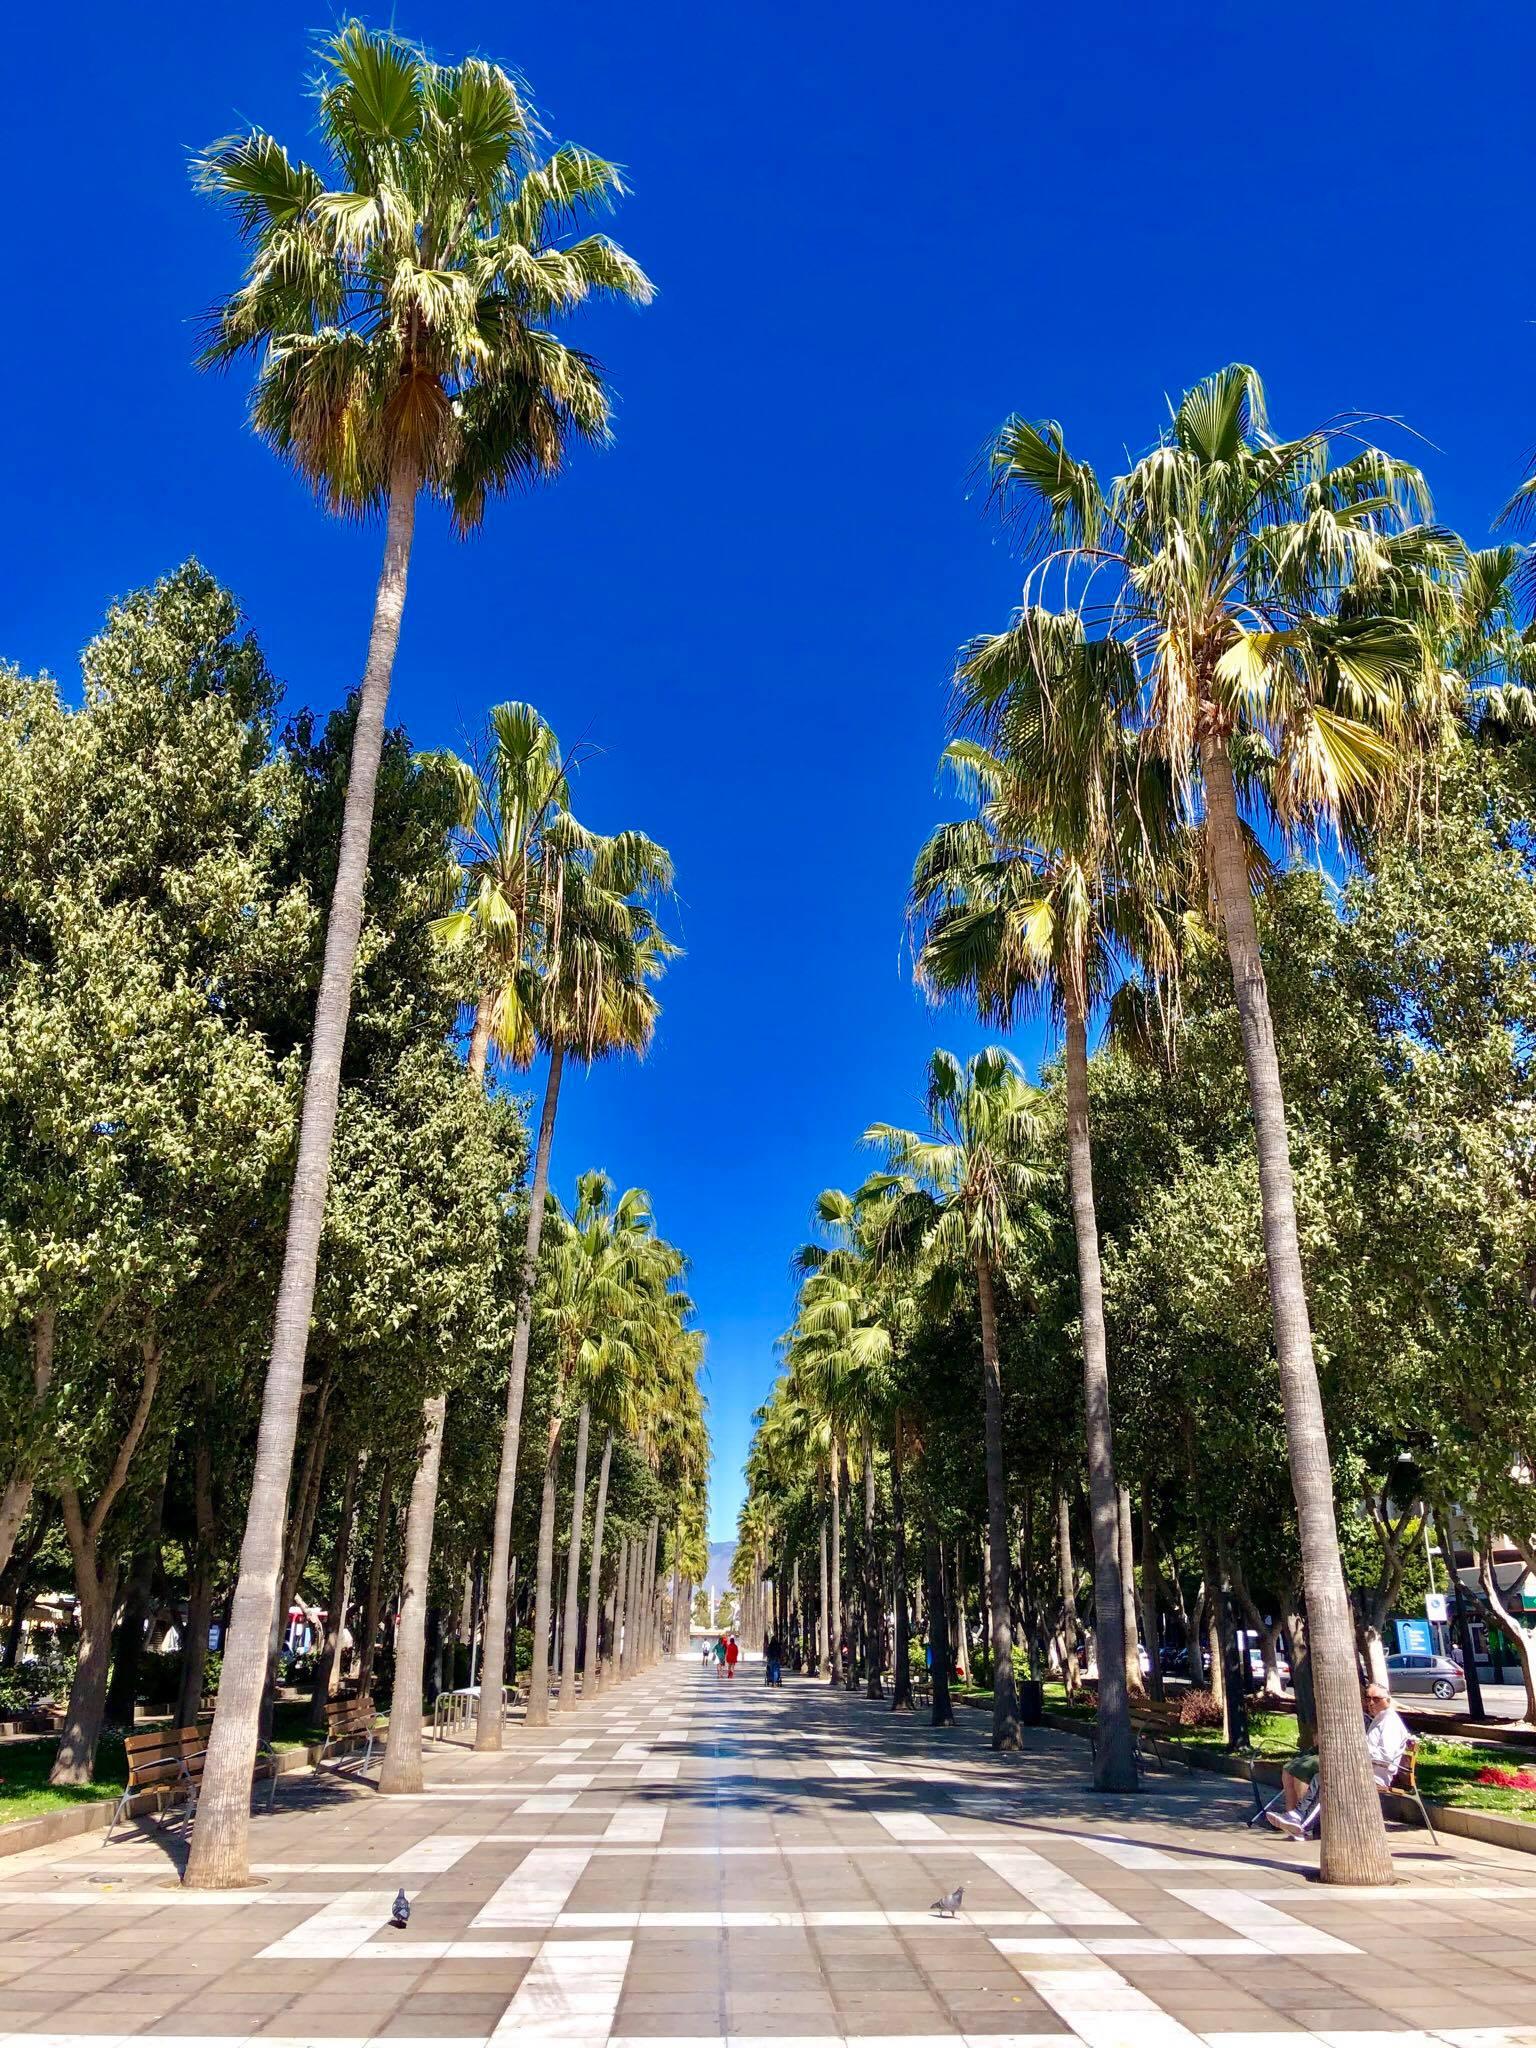 Kach Solo Travels in 2019 Thanks to Cámara de Comercio de Almería4.jpg